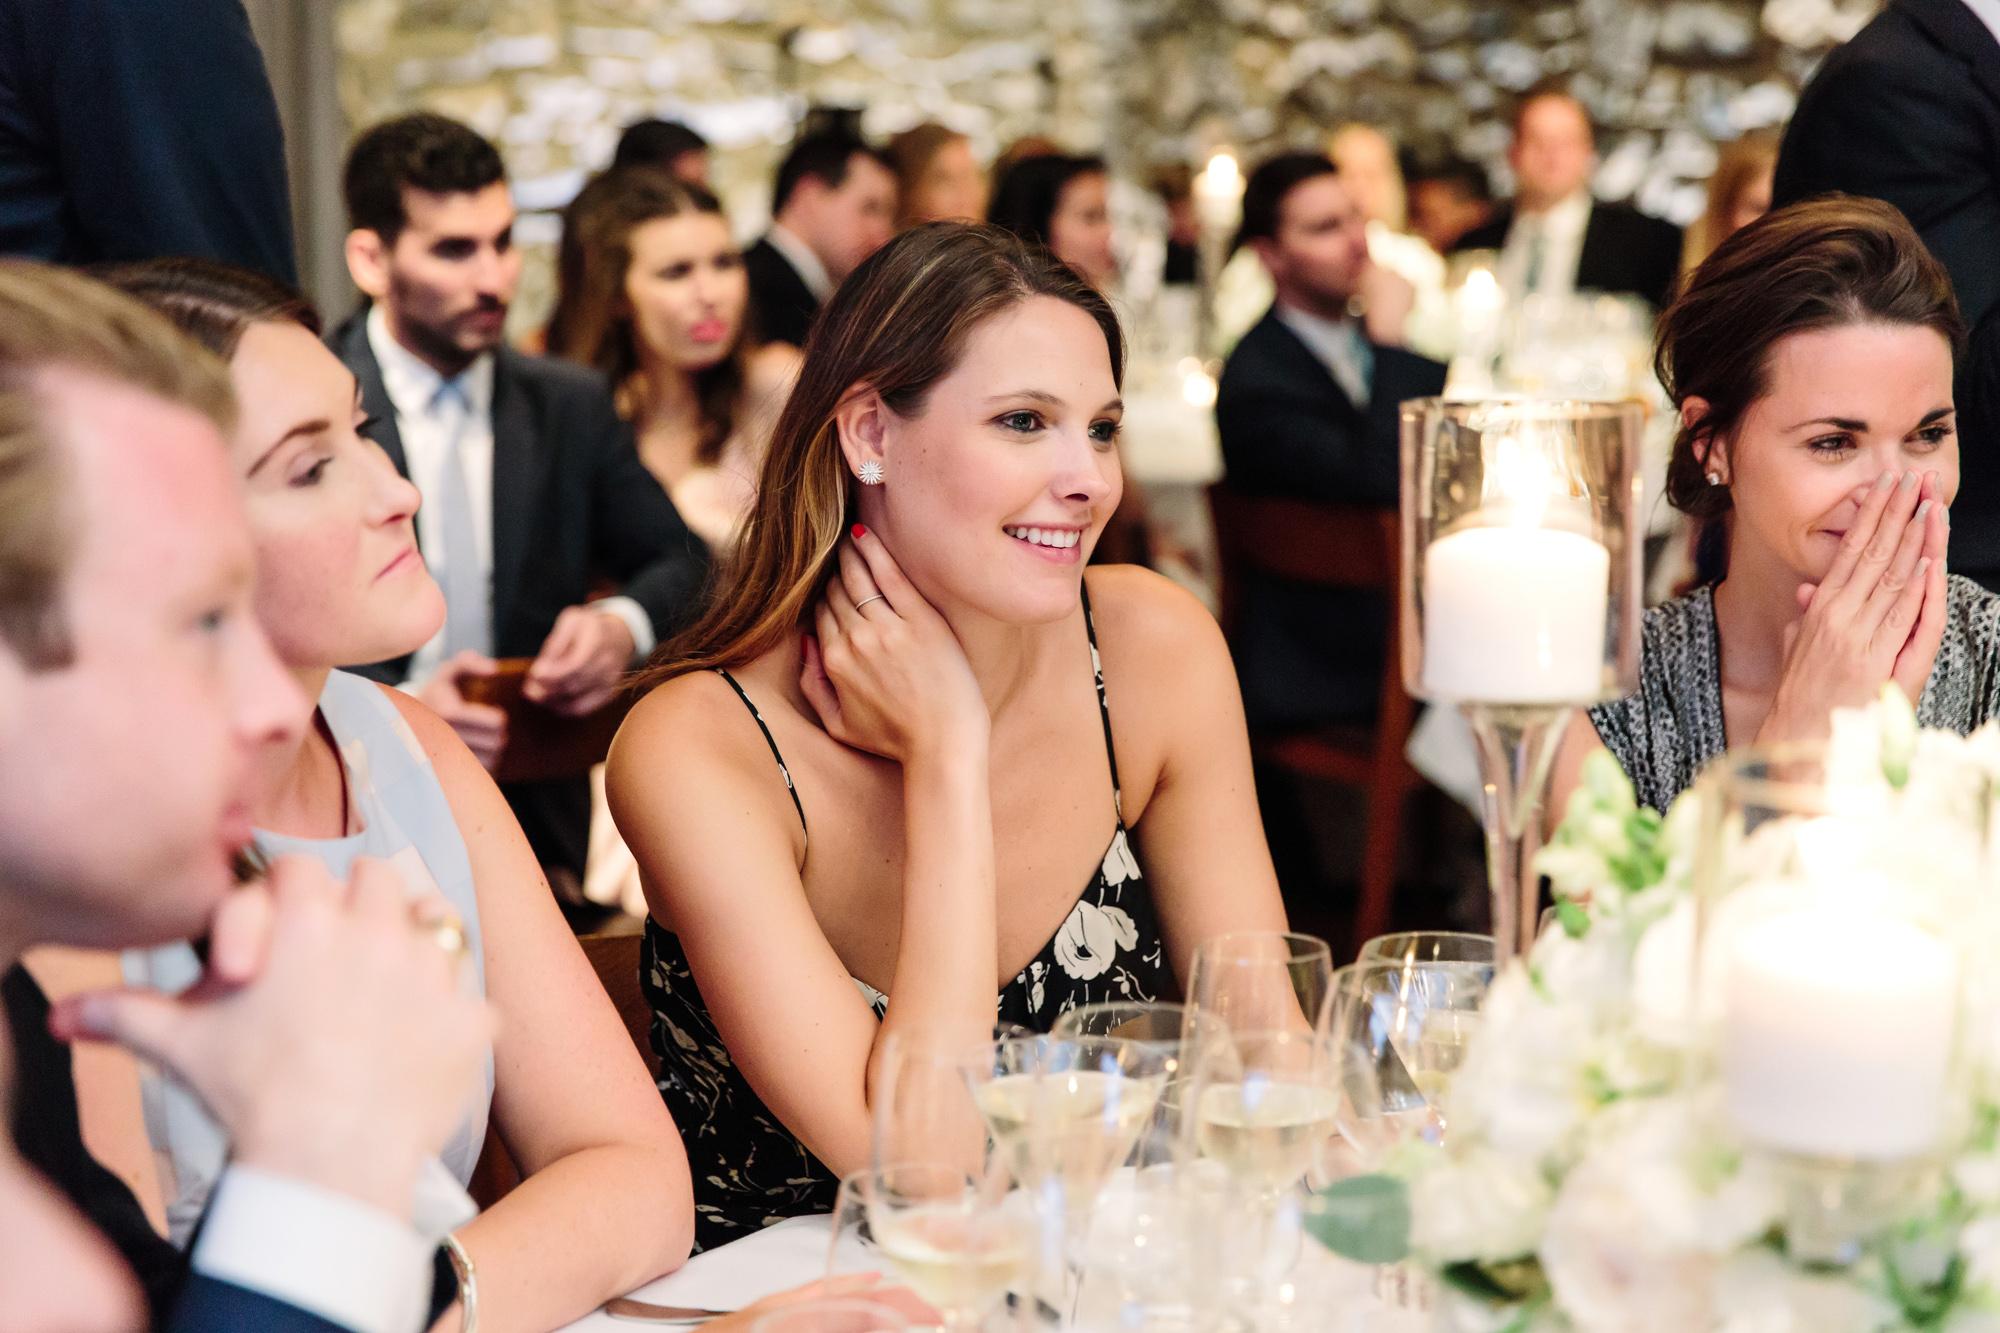 59_Jessica_Ted_Blue_Hill_Stone_Barns_Wedding_Pocantico_NY_Tanya_Salazar_Photography_168.jpg